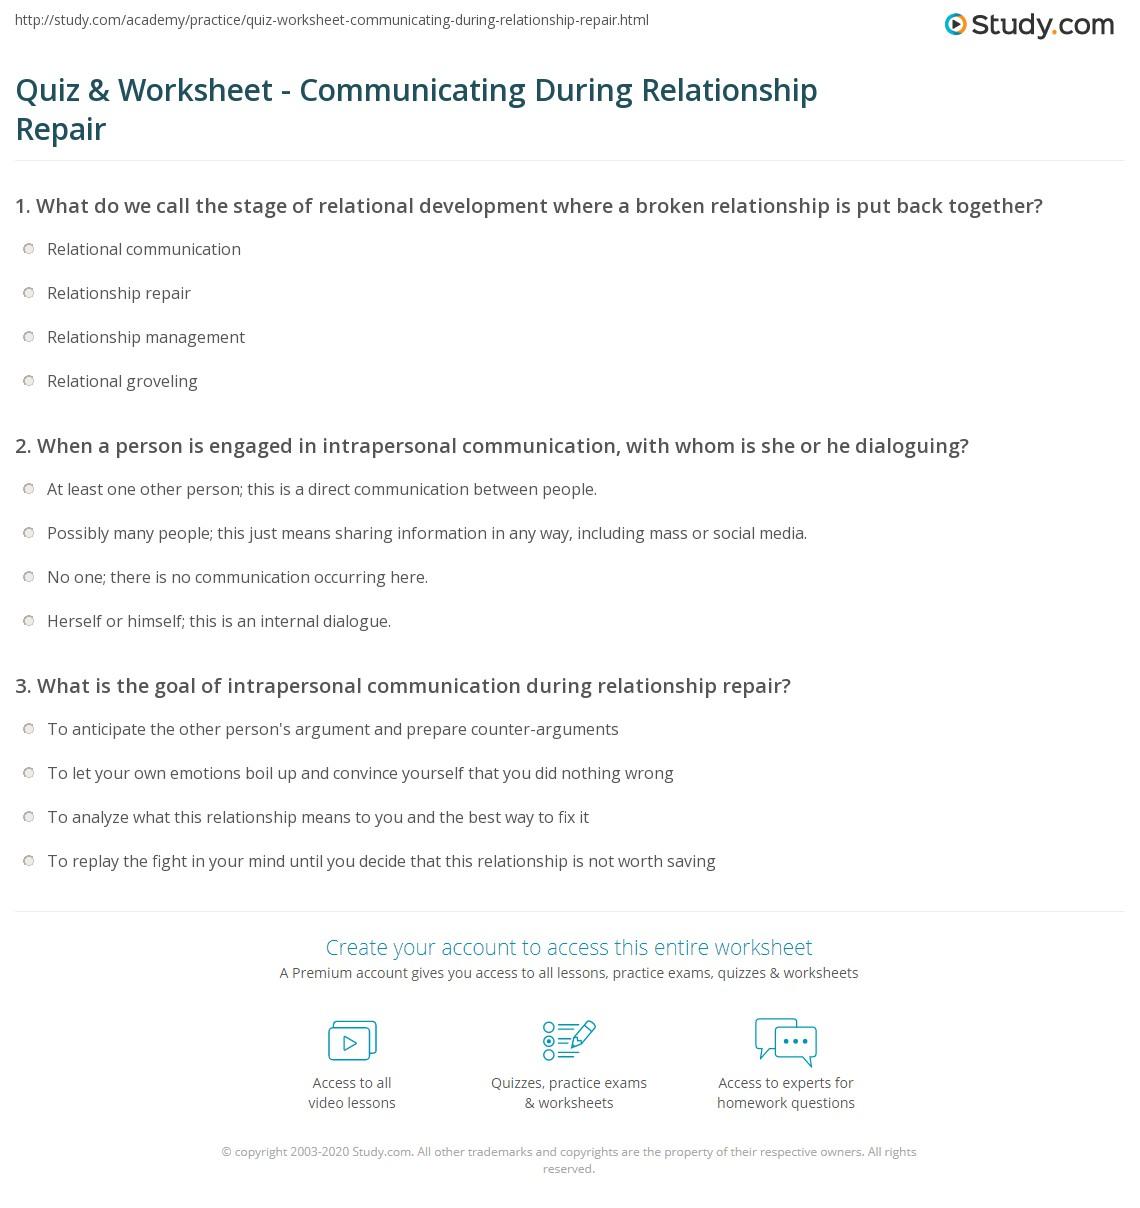 Worksheets Healthy Relationship Worksheets httpsstudy comacademypracticequiz worksheet